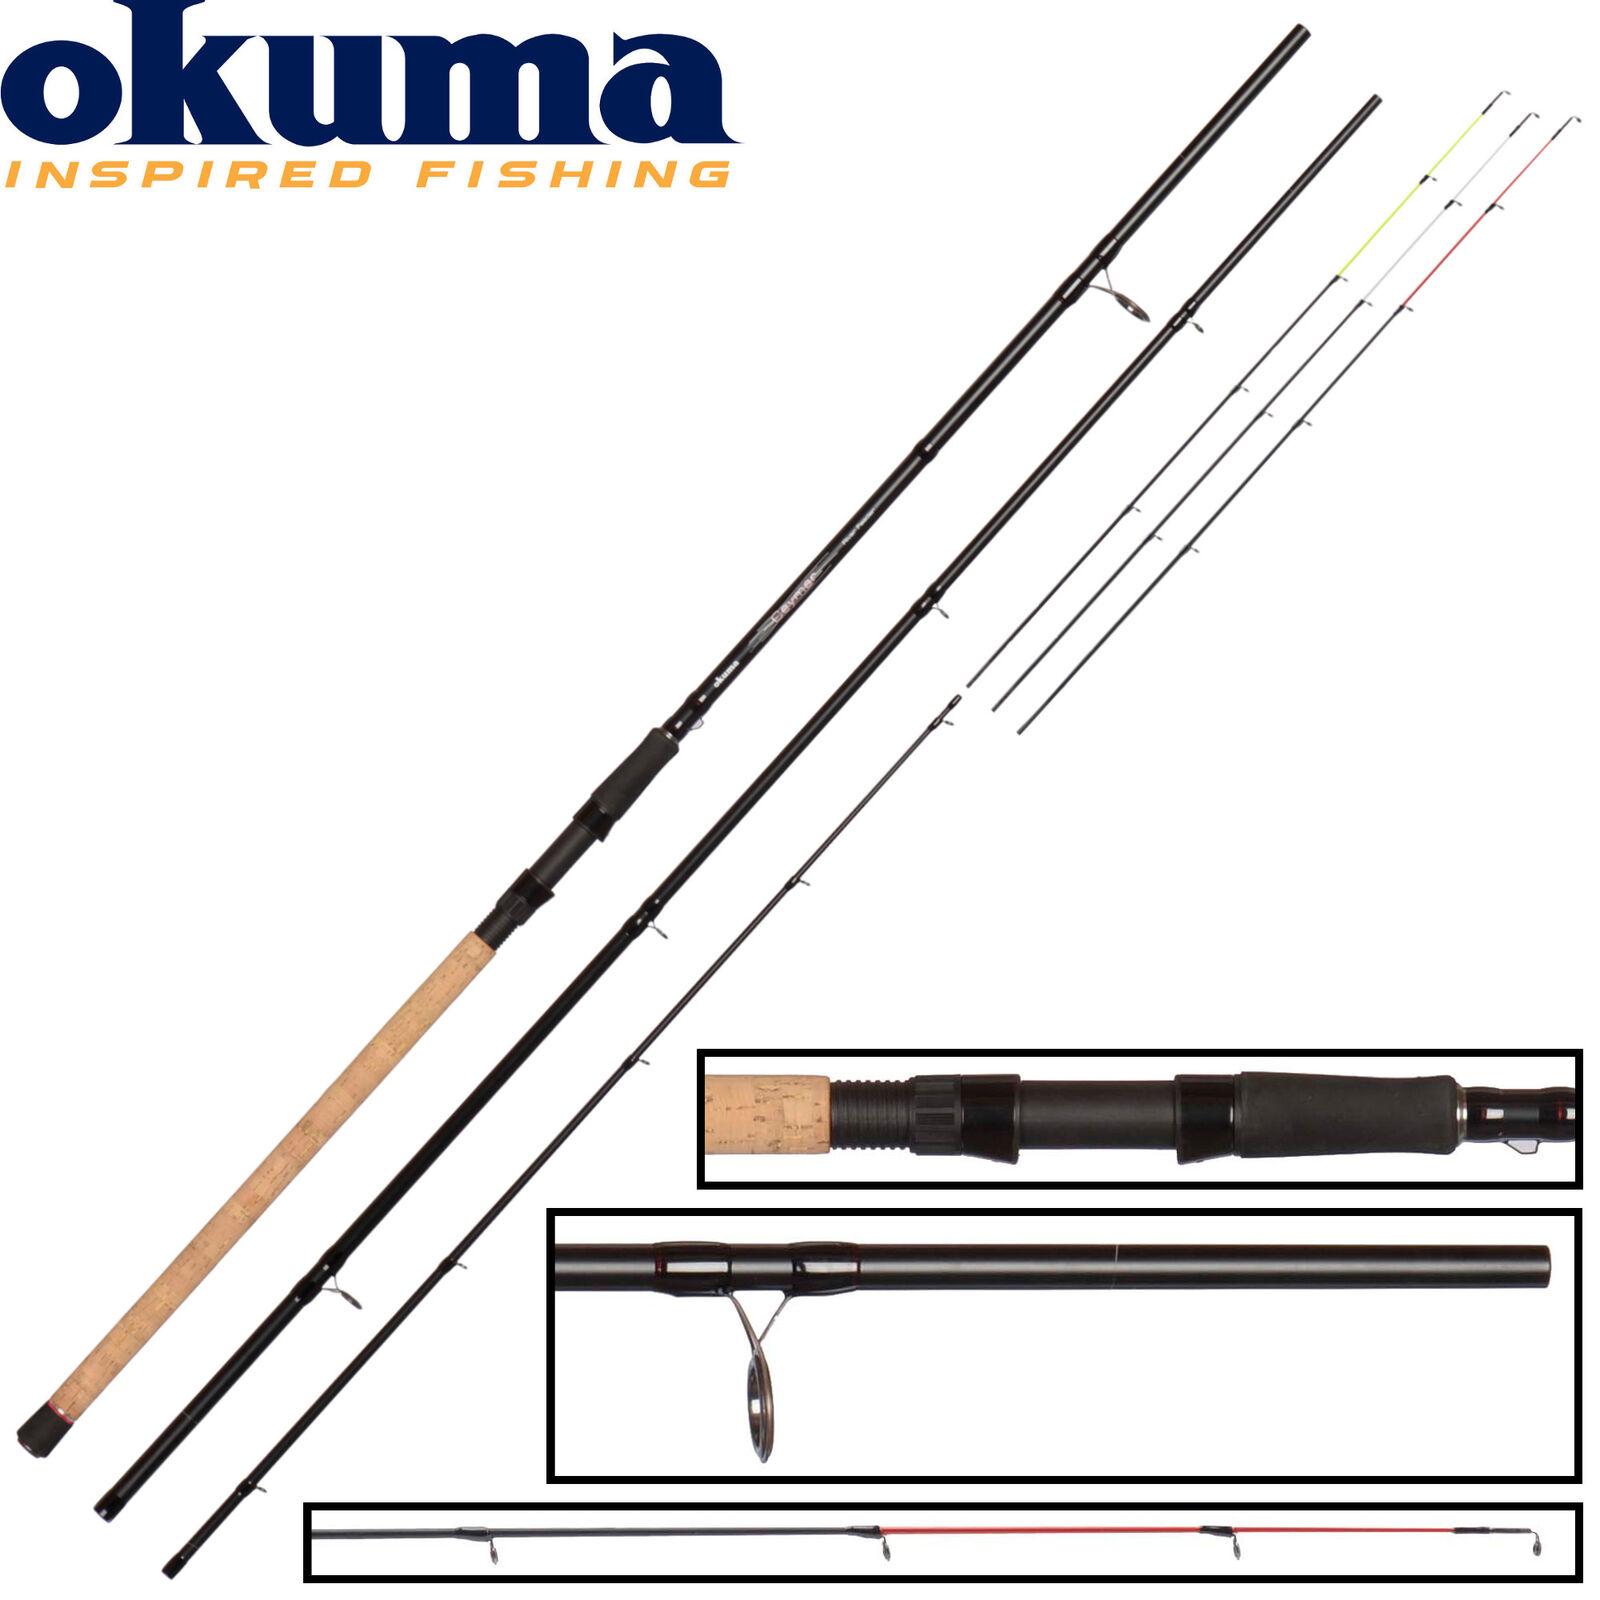 Okuma Feederrute Ceymar 3,90m 60-120g - Angelrute, Feederrute, Grundrute    Online Shop